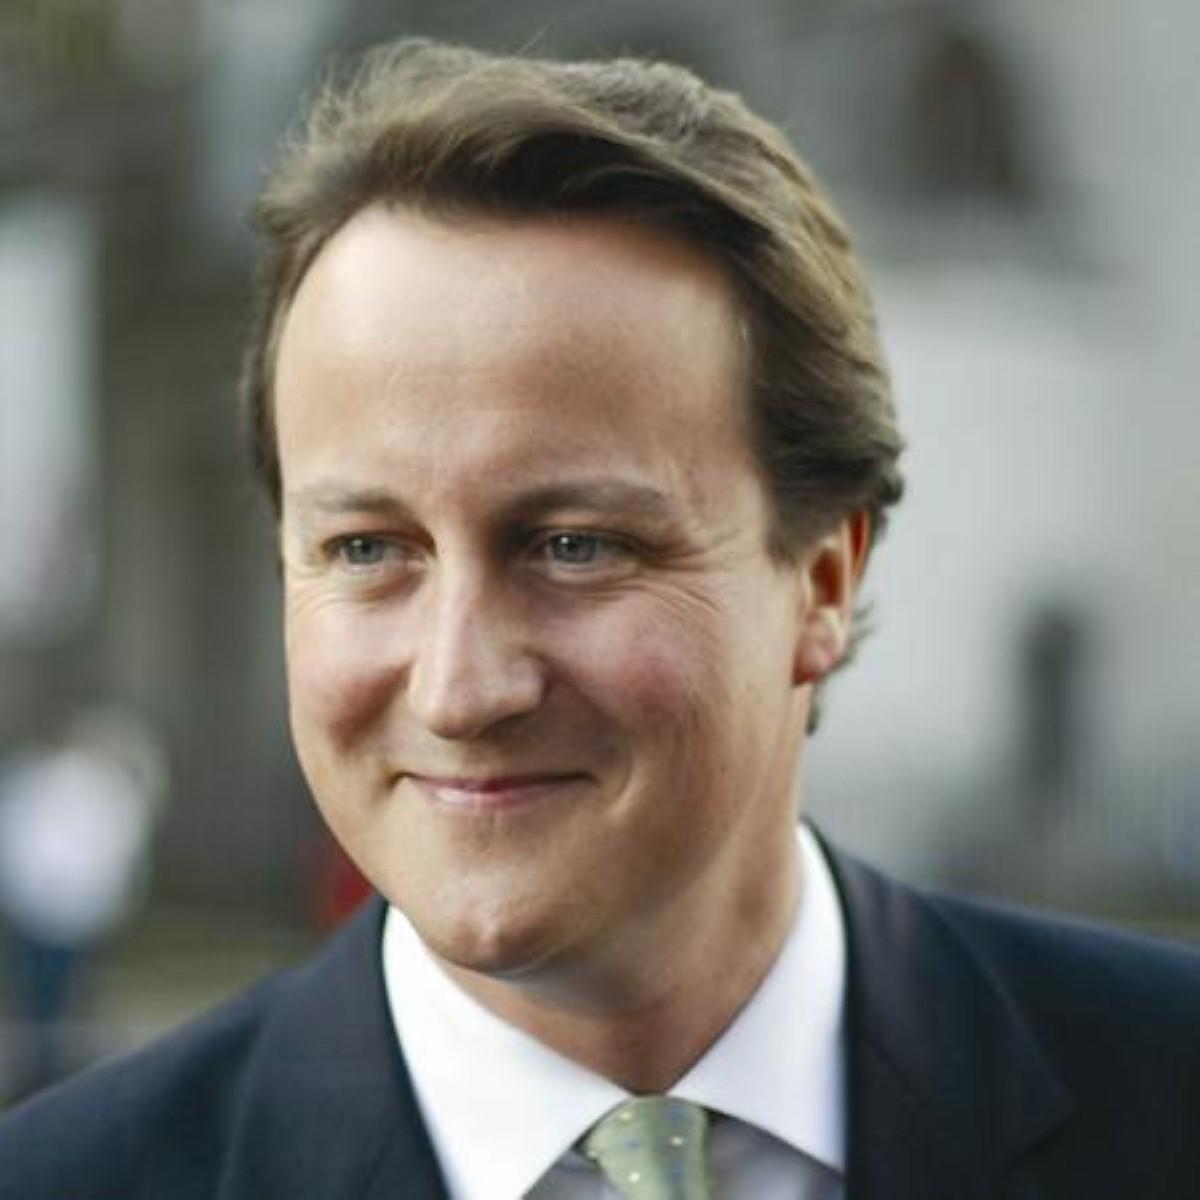 David Cameron manifesto speech in full